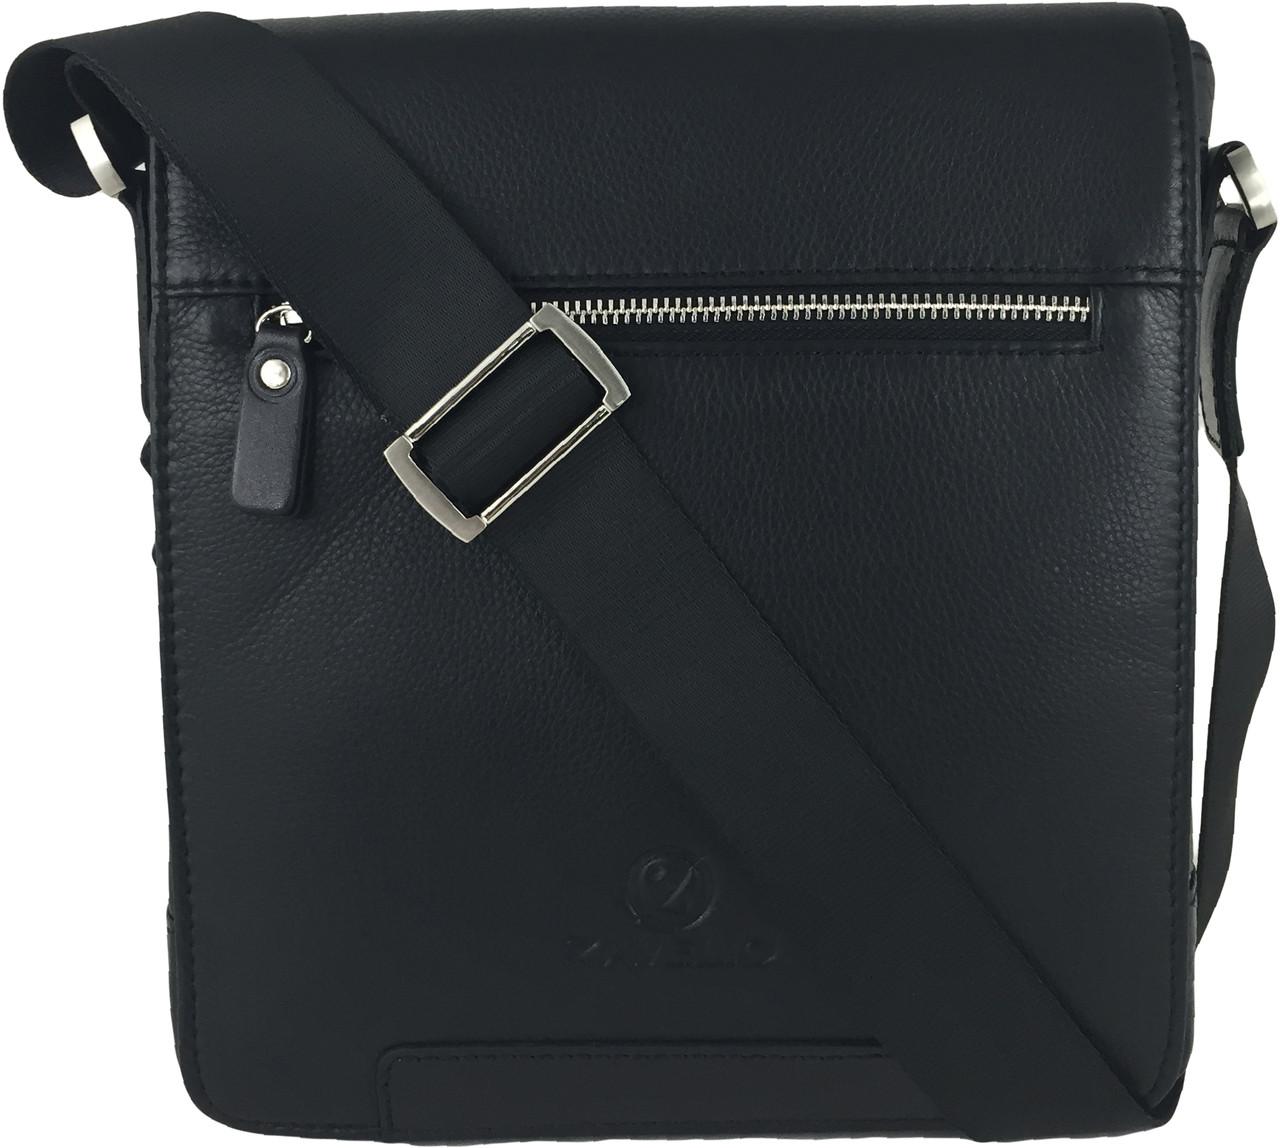 Zavelio Men s Genuine Leather Small Crossbody Shoulder Messenger Bag - Black   74974bdef59ba